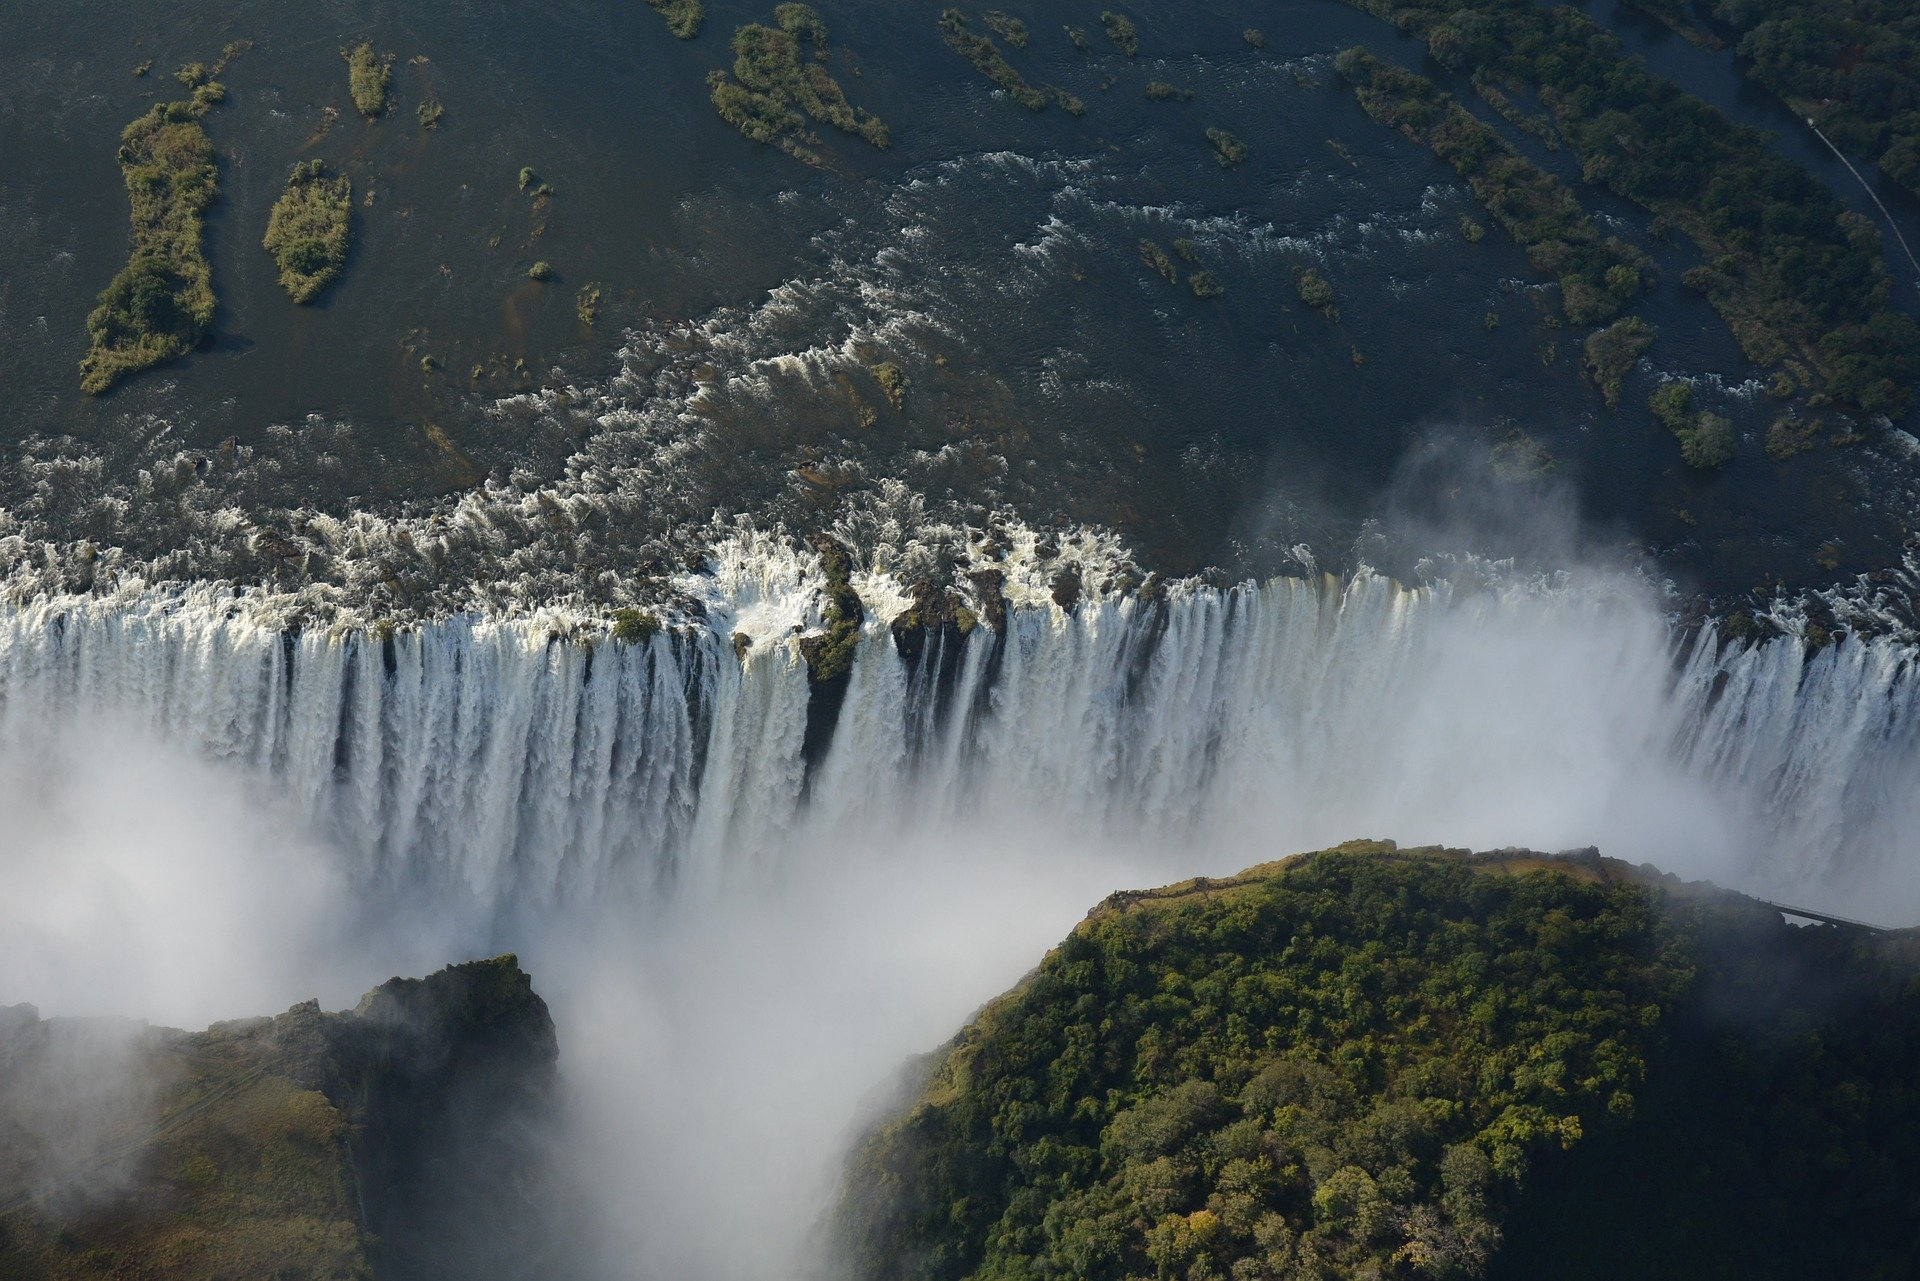 Victorial Falls. Source: Pixabay